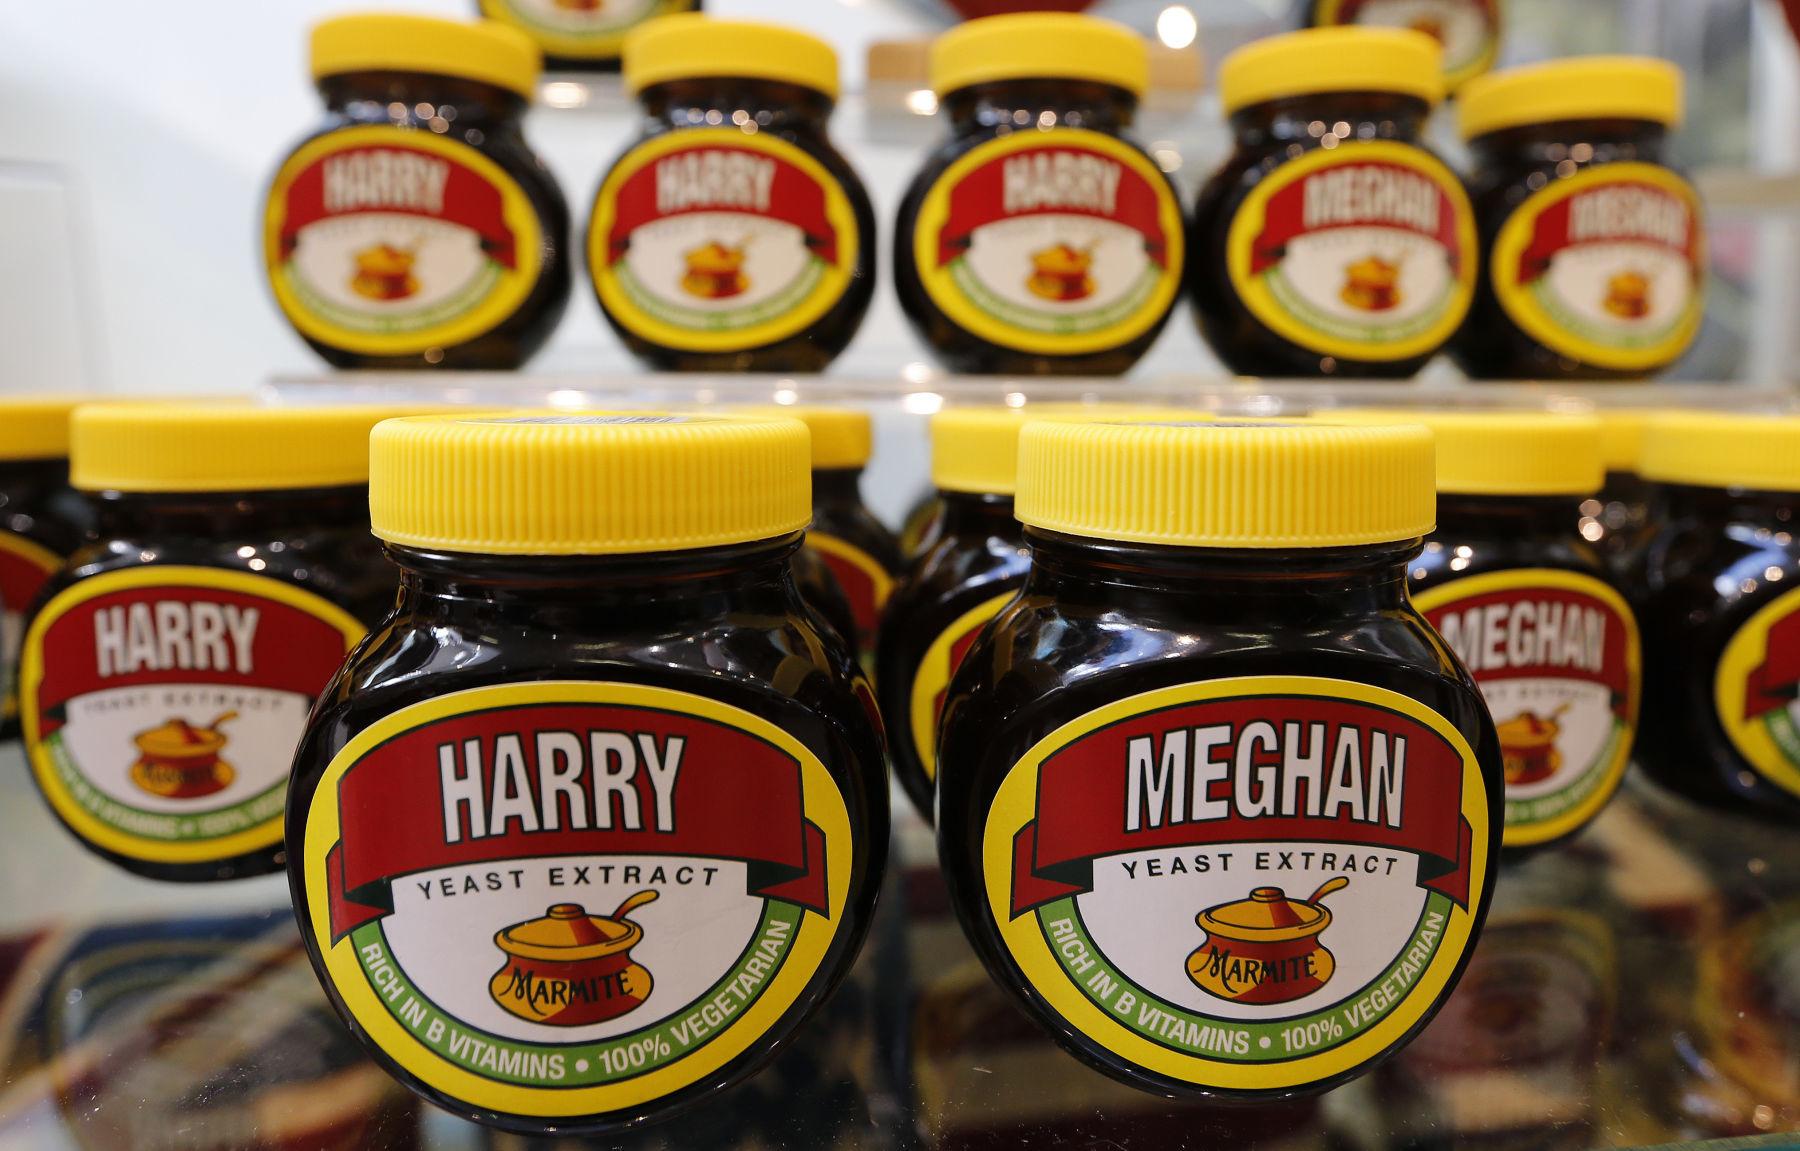 Britain Royal Wedding Merchandise Mania Marketers cashing